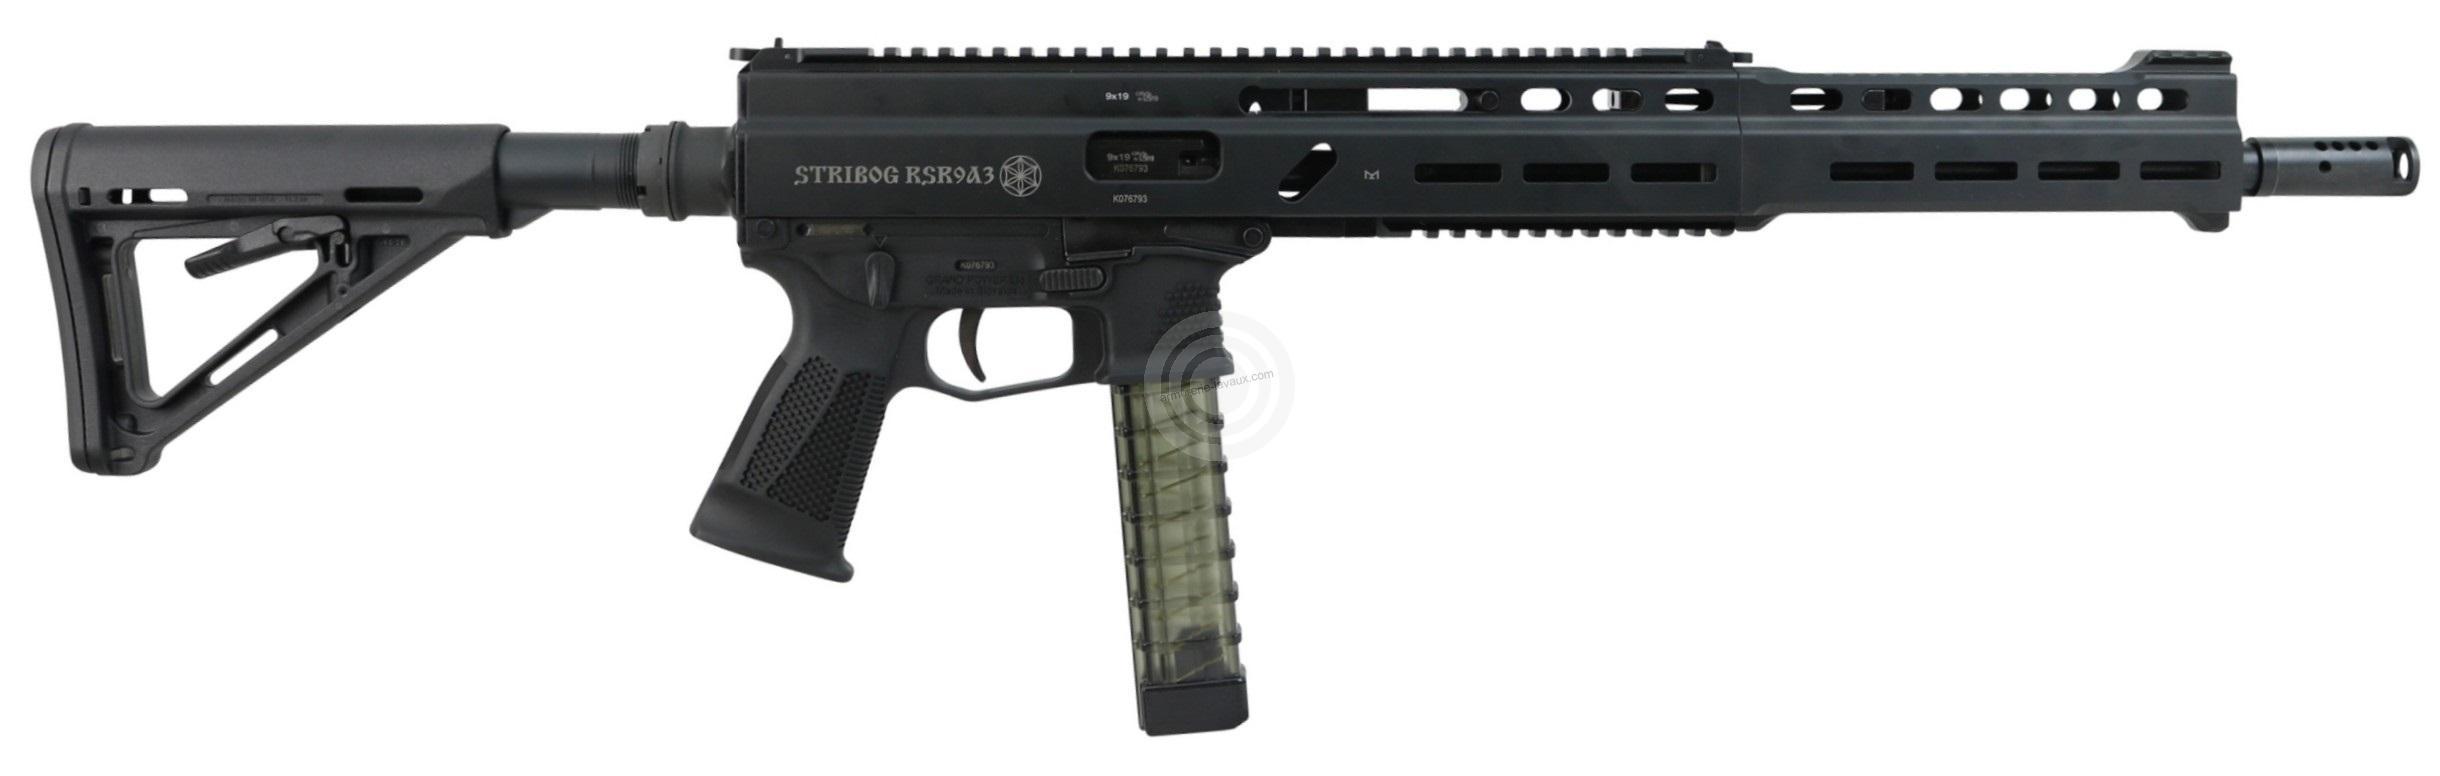 Carabine GRAND POWER Stribog SR9 A3